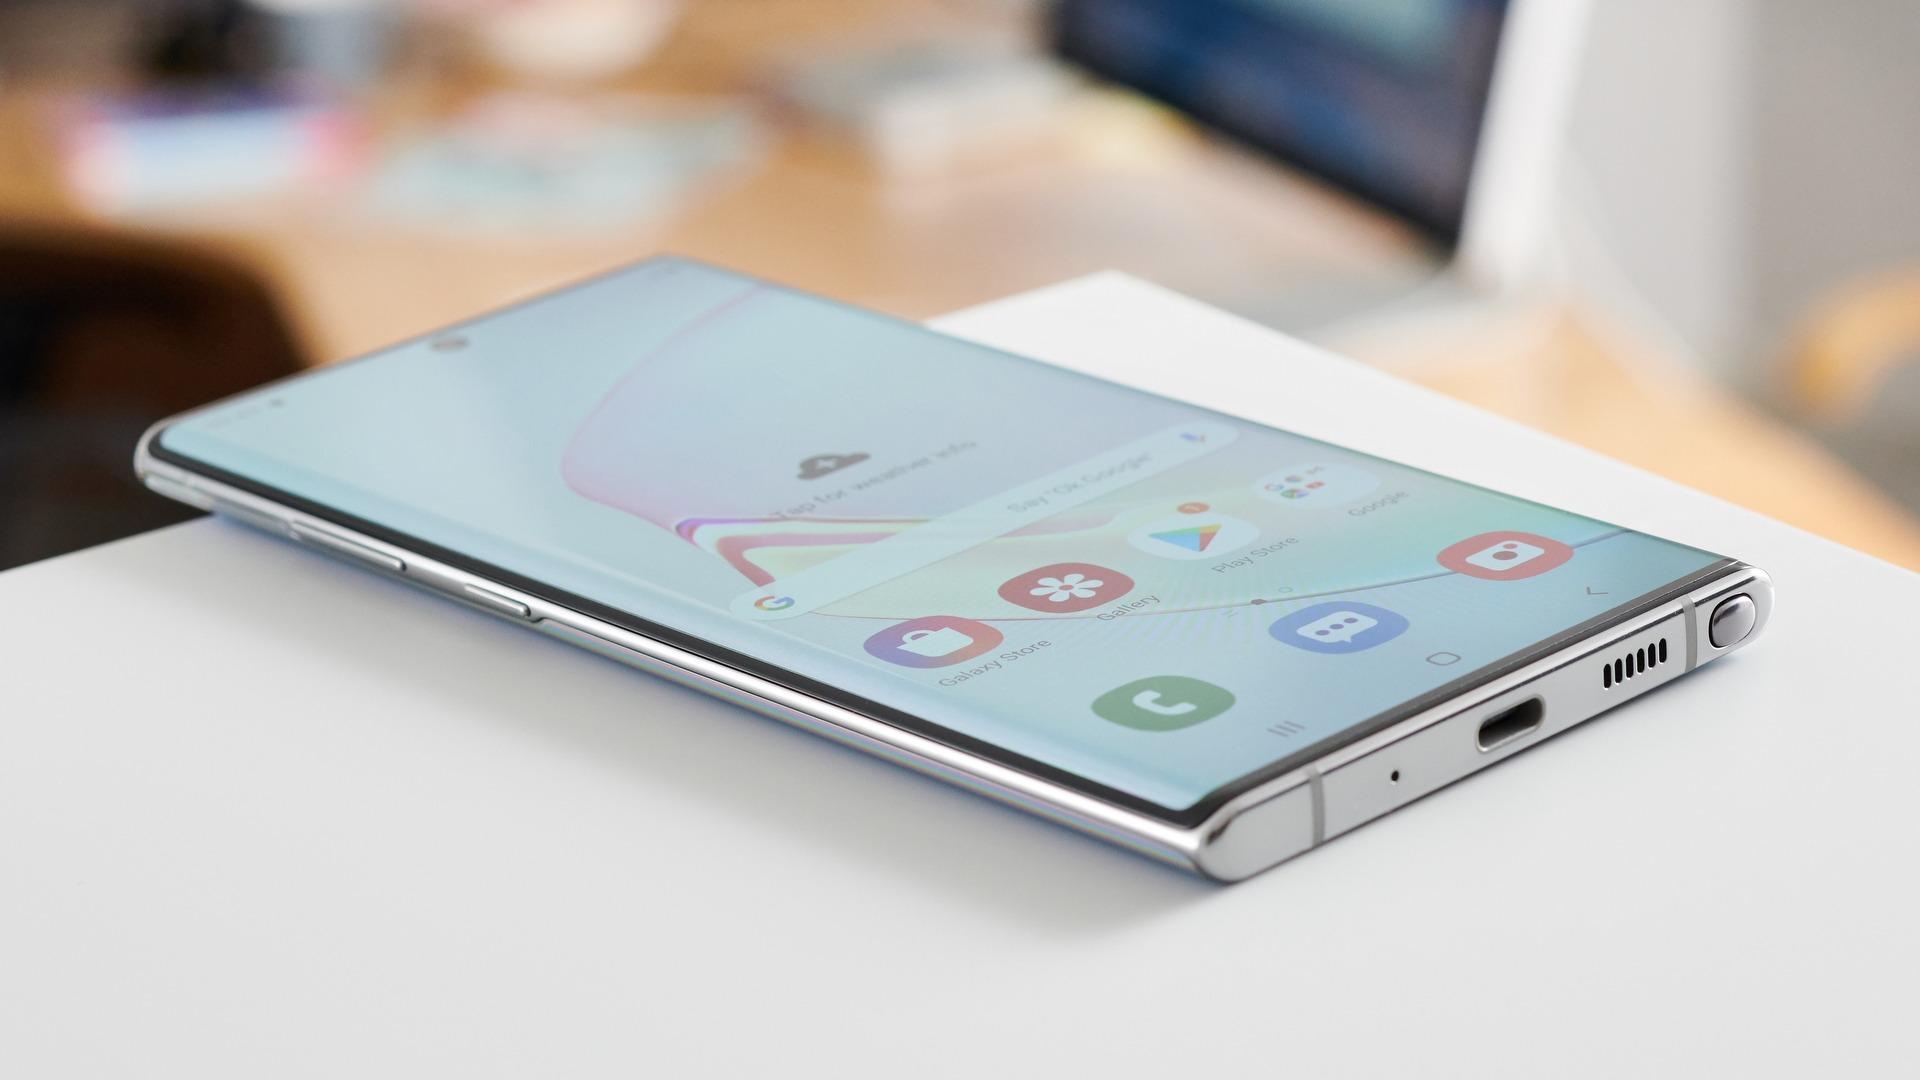 Samsung Galaxy Note 10 vs LG G8 Thinq